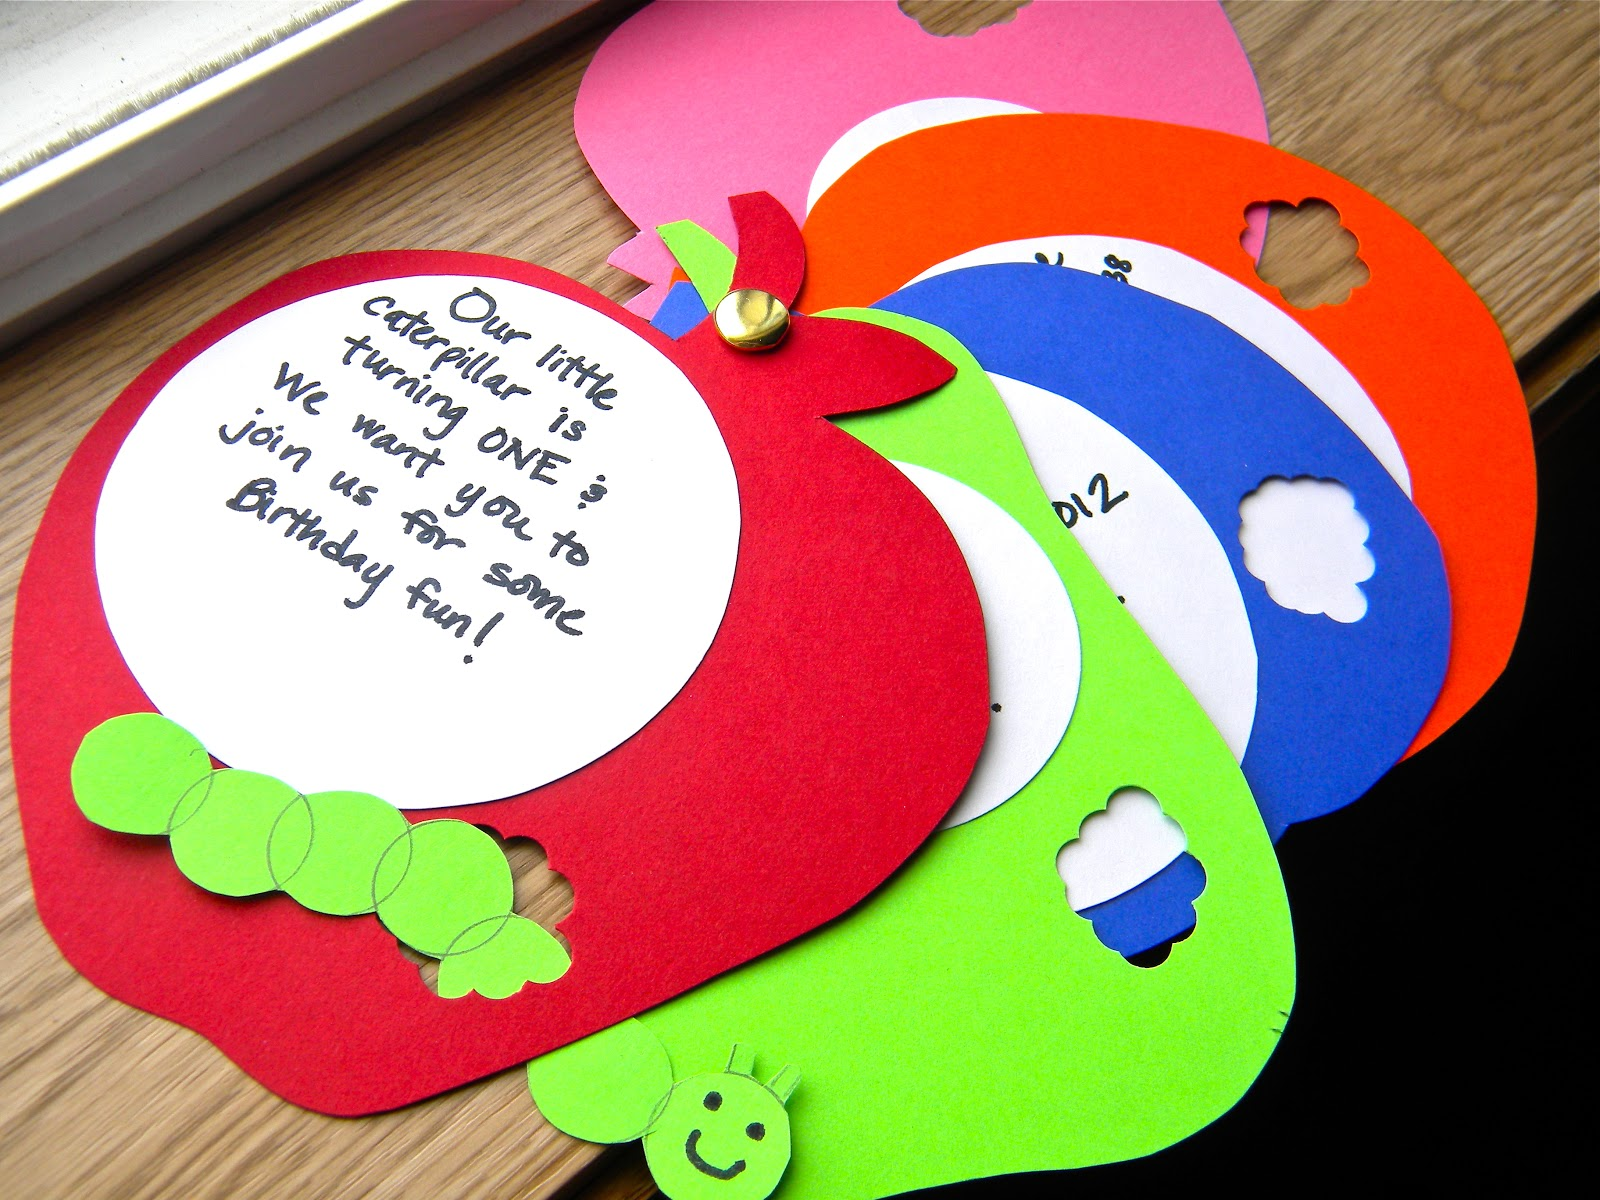 Hungry Caterpillar Invitations was adorable invitations ideas